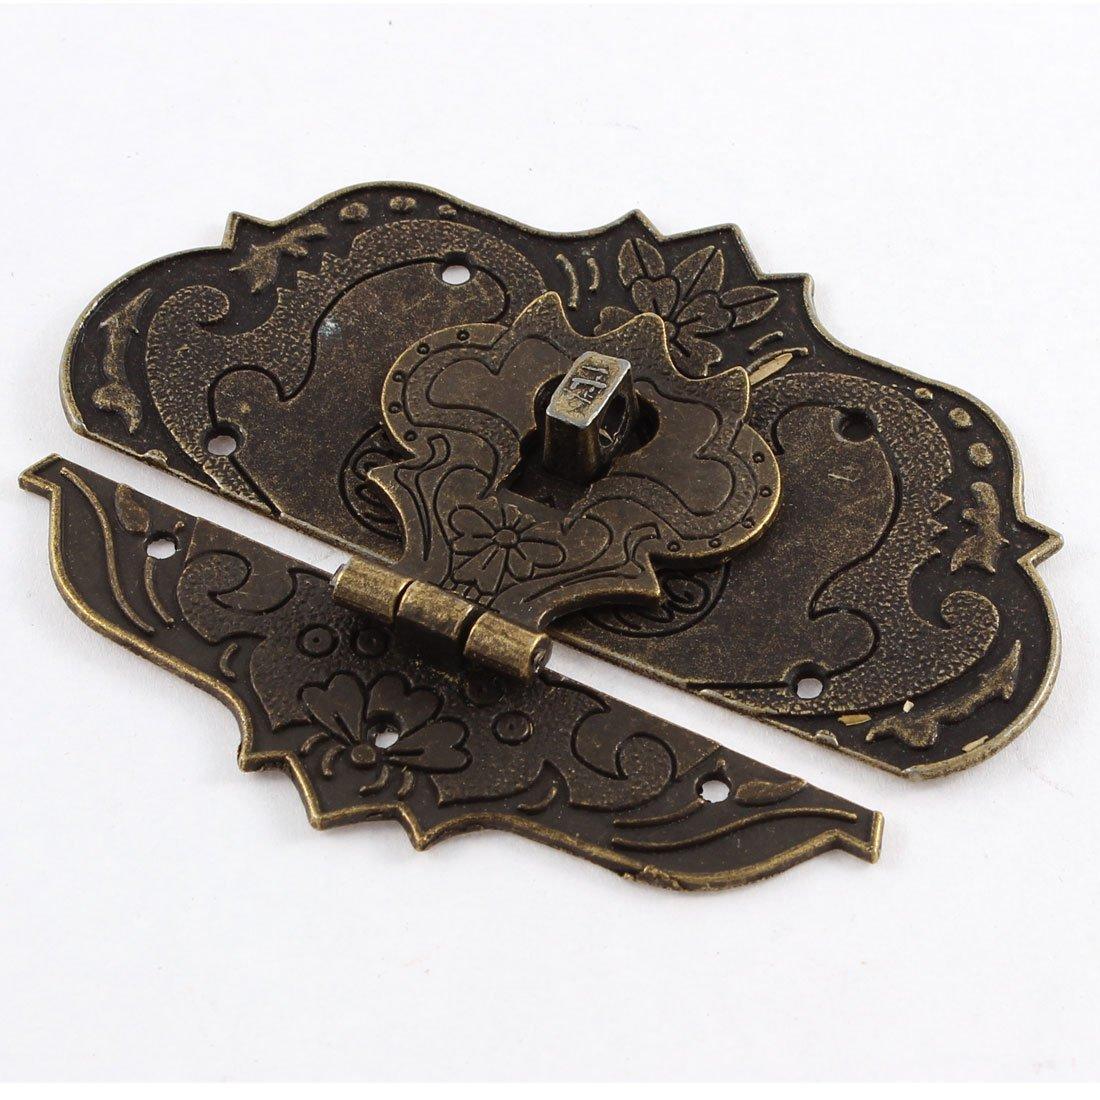 Sourcingmap–® 97mmx73mm maleta Joyero aldaba para candados Latch Lock tono de bronce antiguo a15060800ux0302